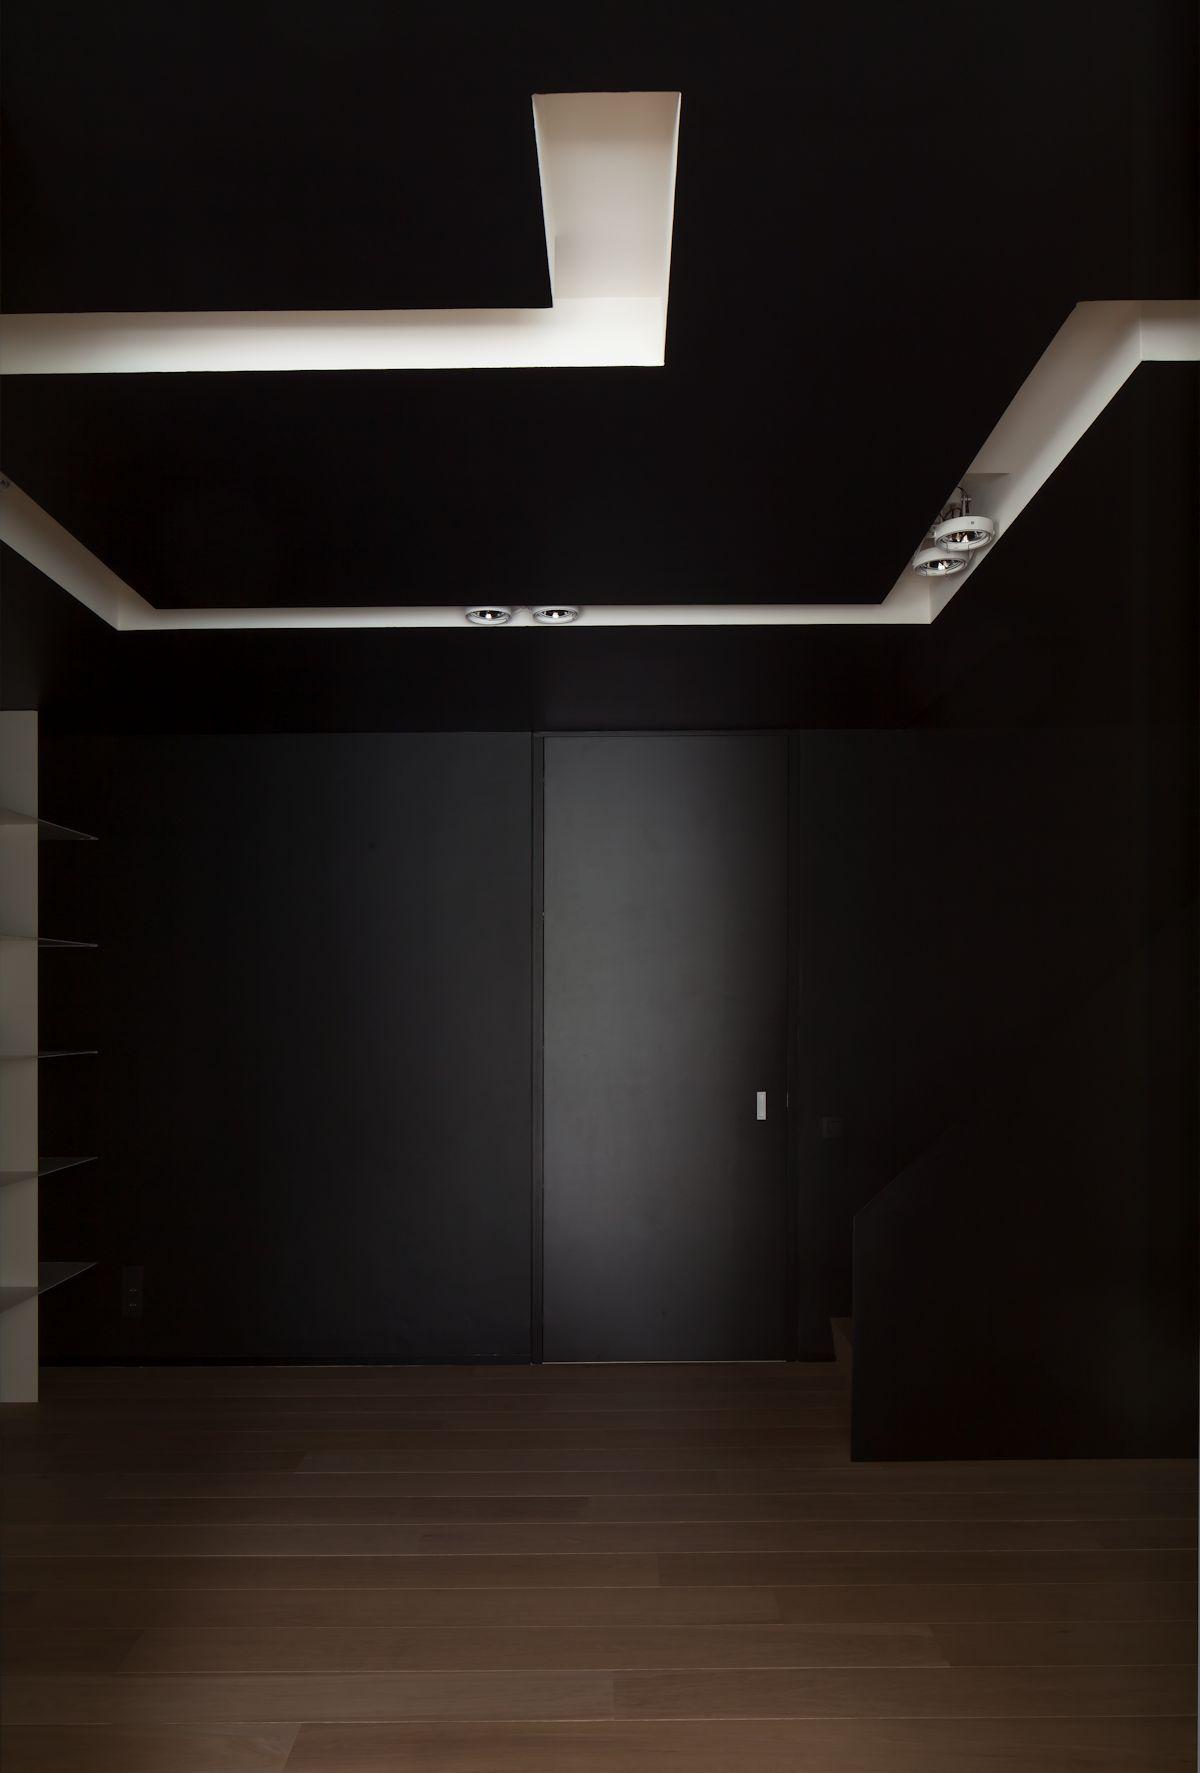 Dark Ceiling, Walls, Contemporary Renovation Brussels Belgium